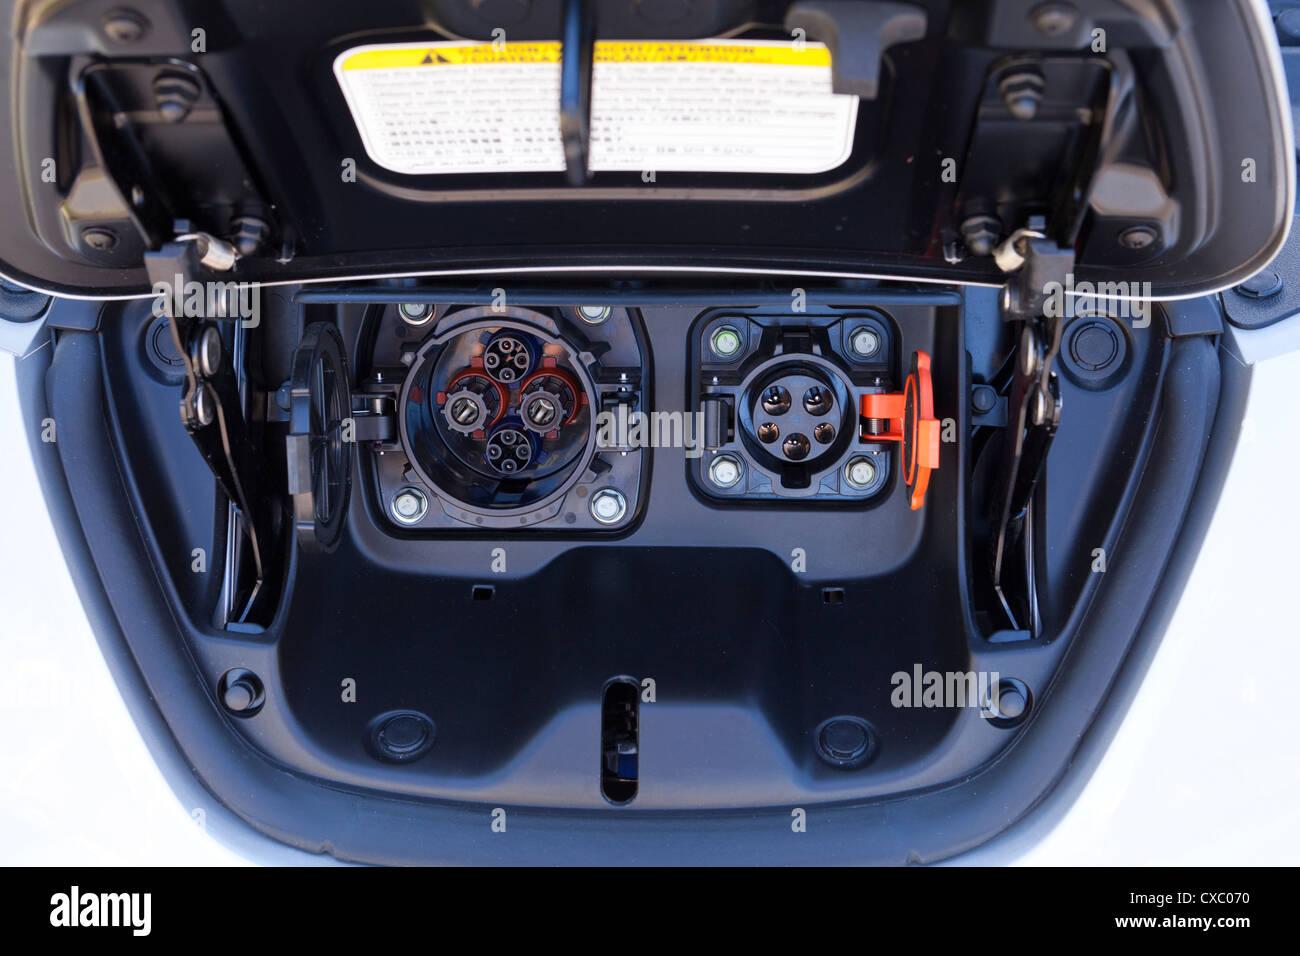 Nissan LEAF electric car power plug - Stock Image